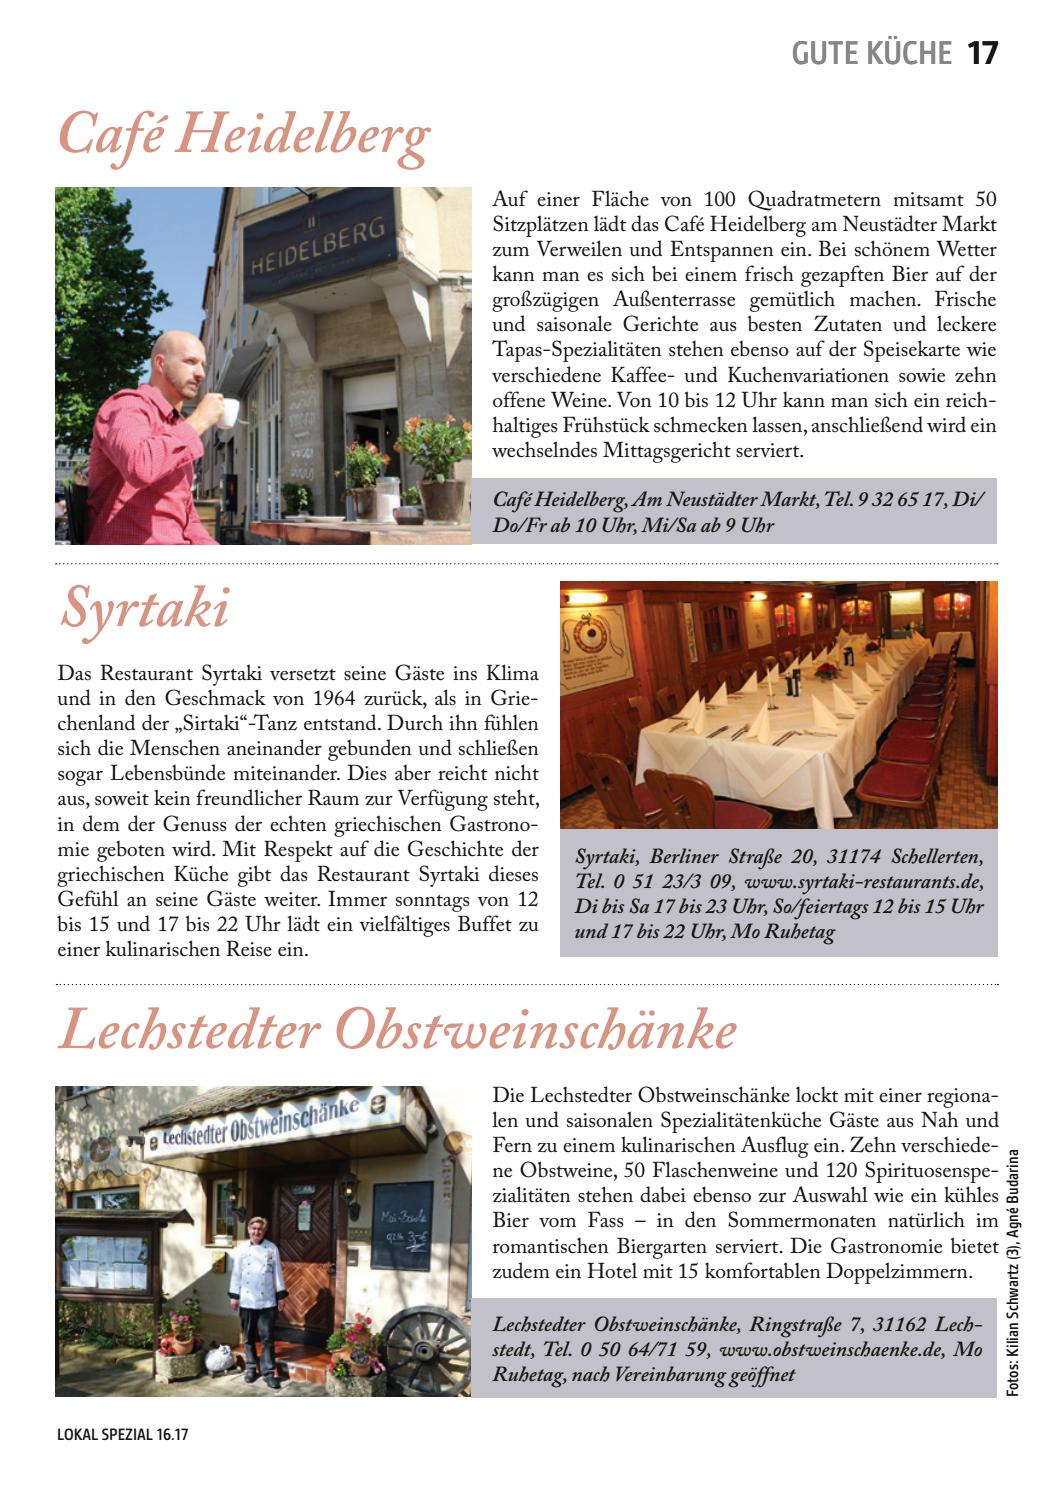 Lokal Spezial 2016 by PUBLIC HILDESHEIM - issuu